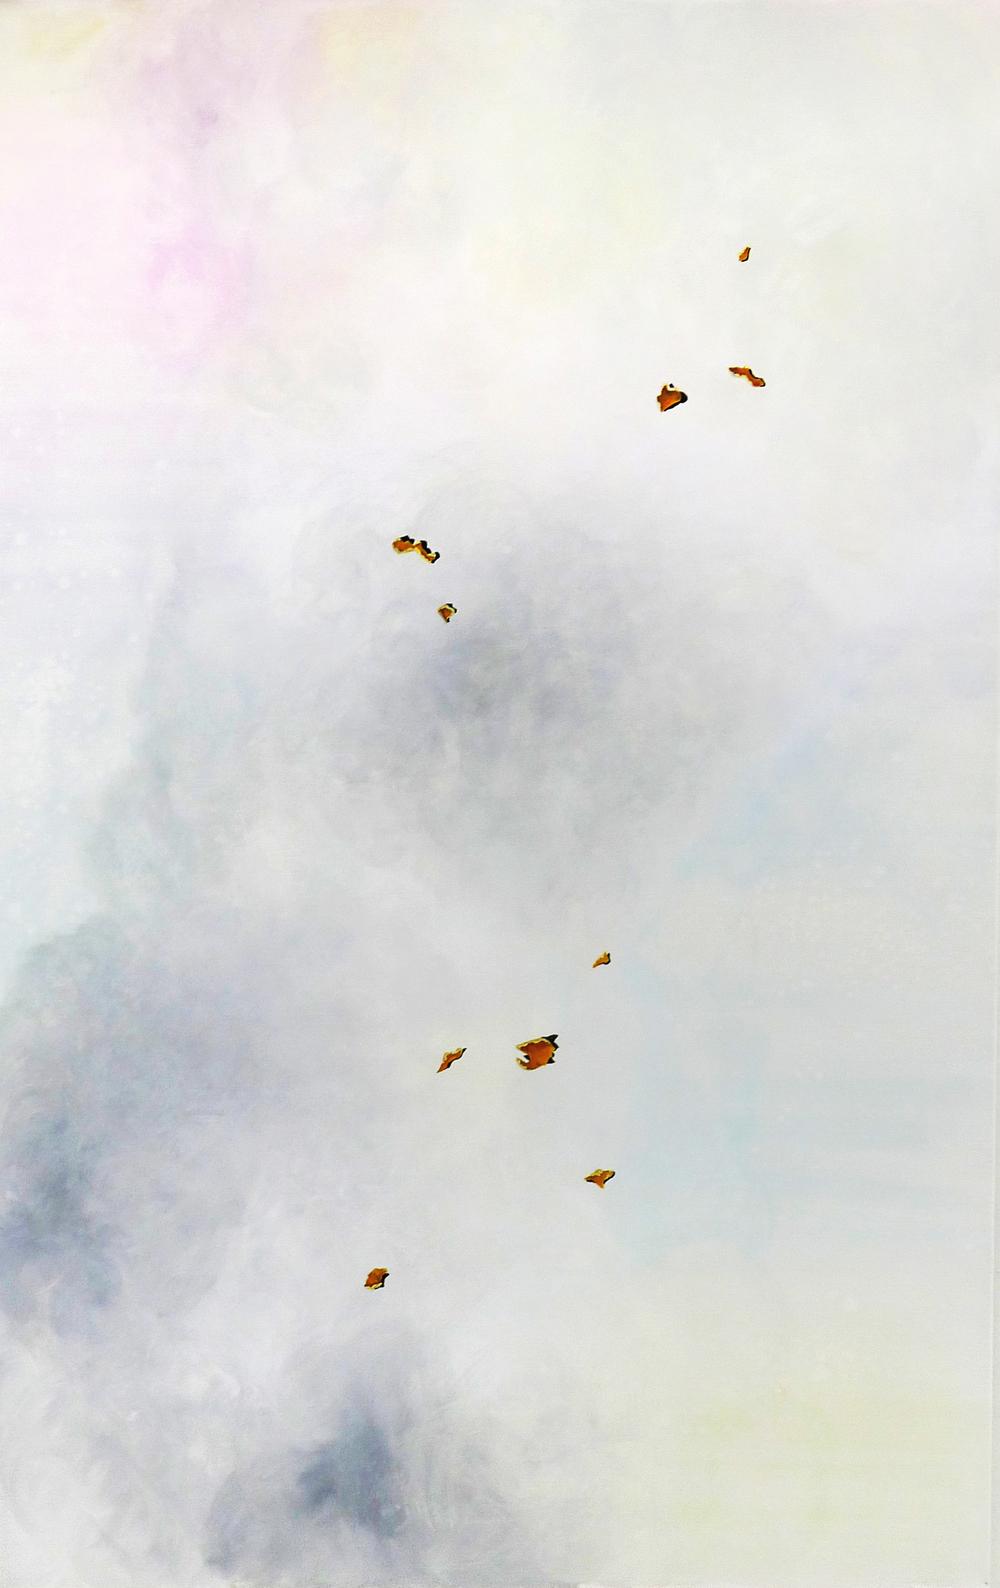 Lauv du er II, 2016